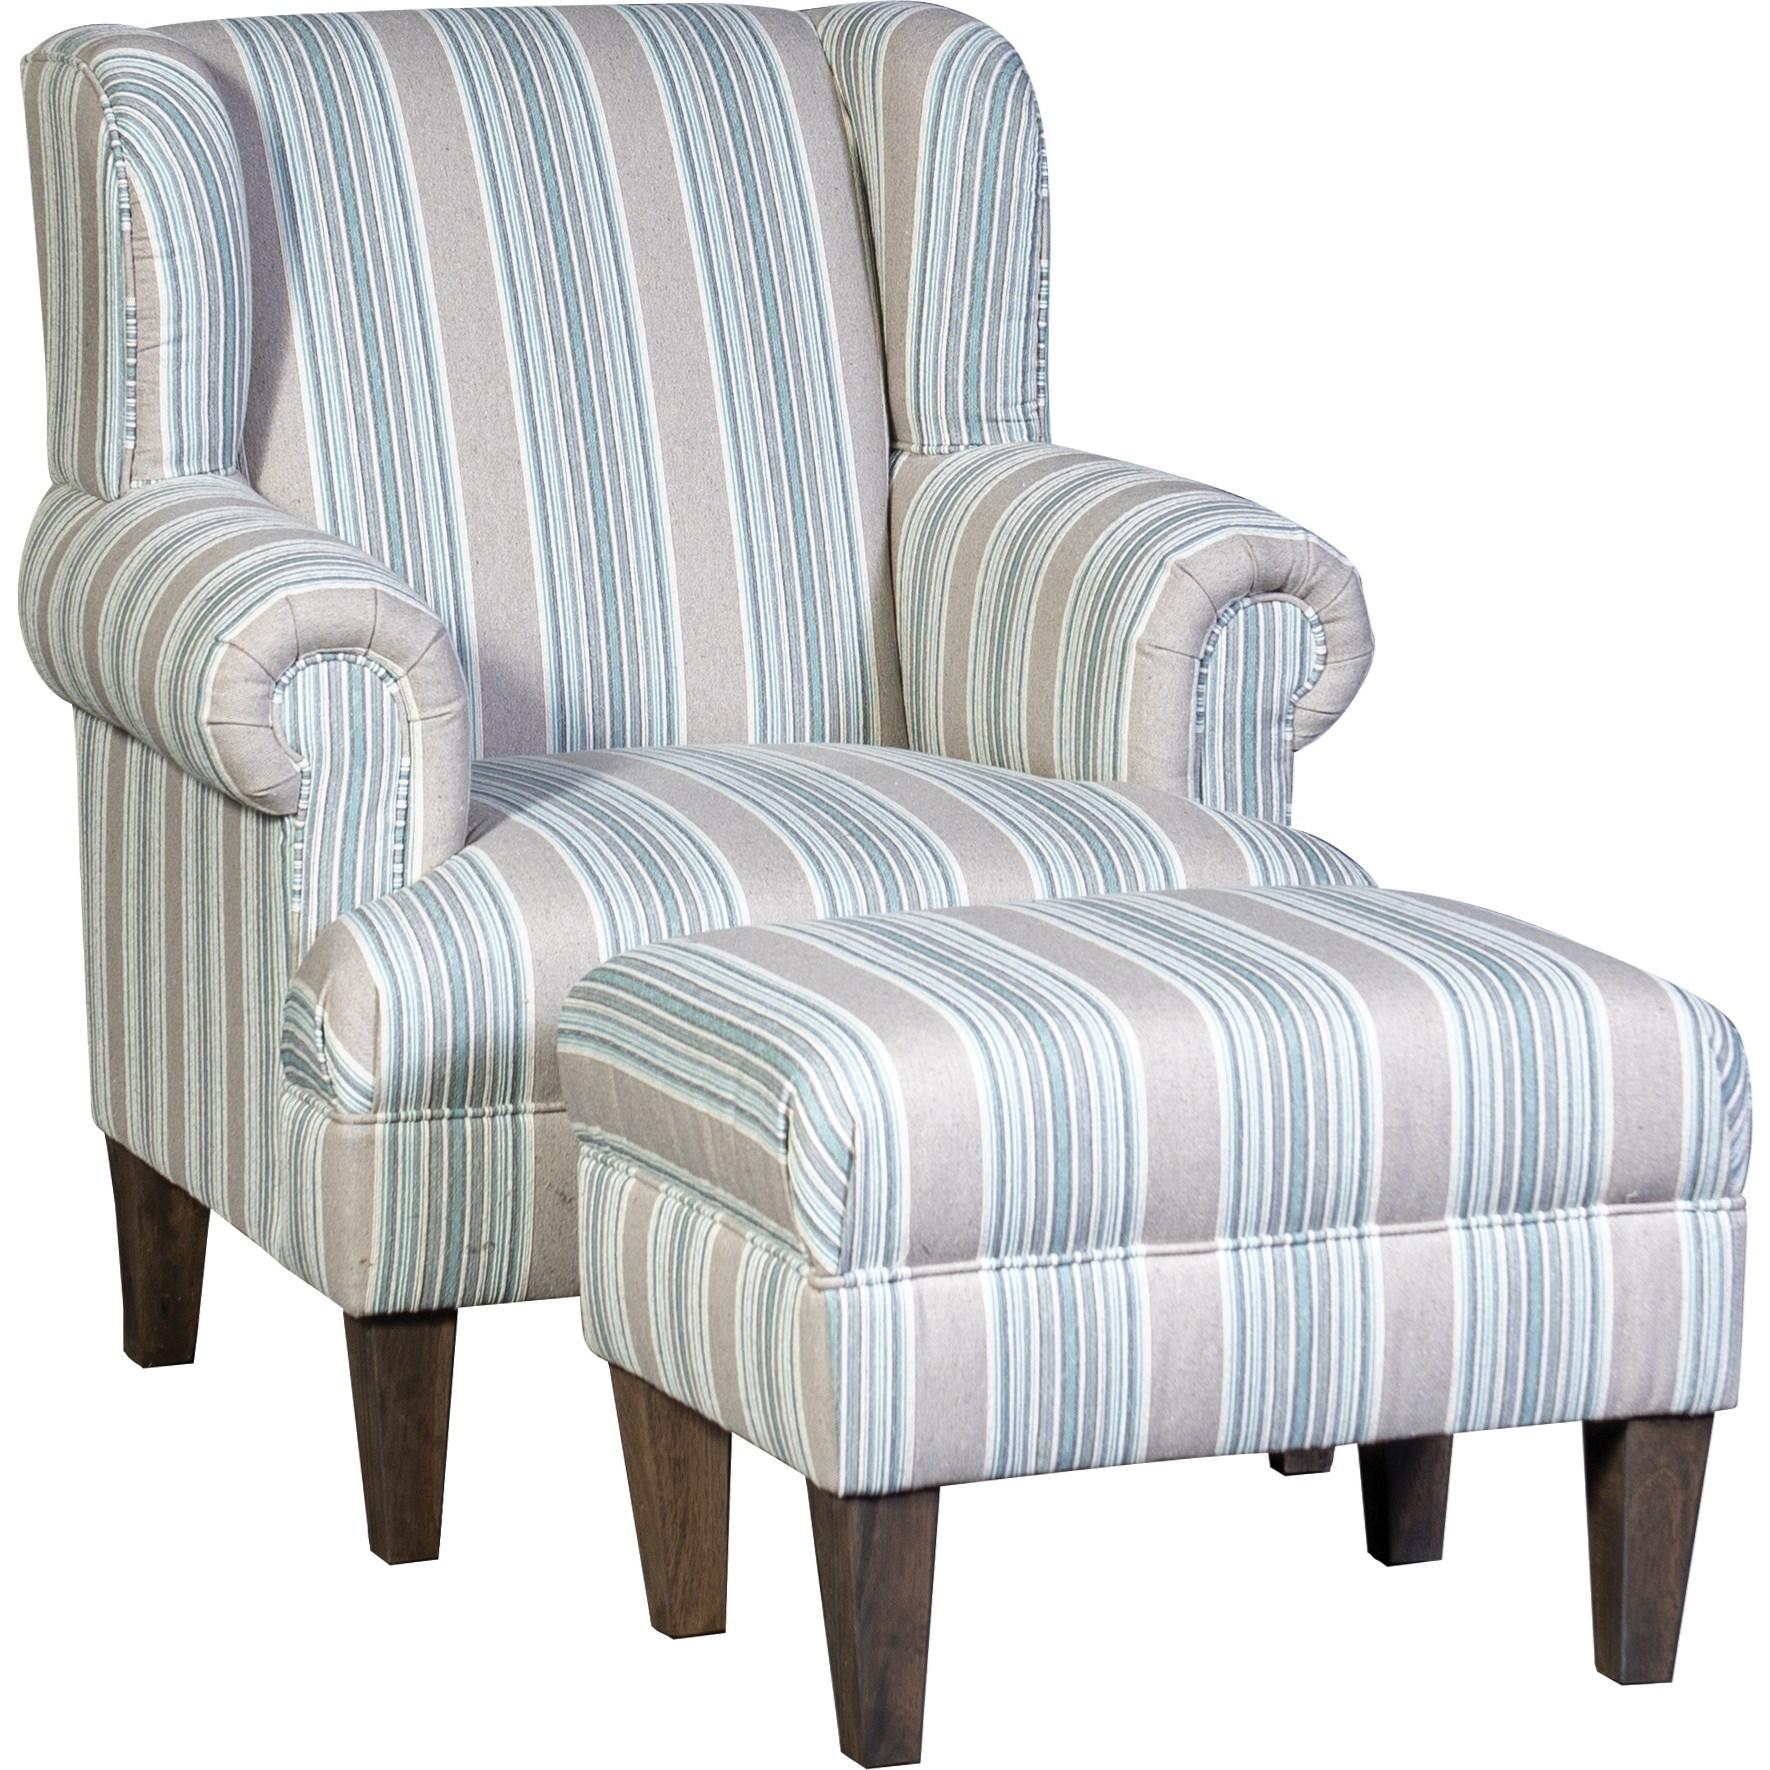 6060 Chair and Ottoman by Mayo at Pedigo Furniture